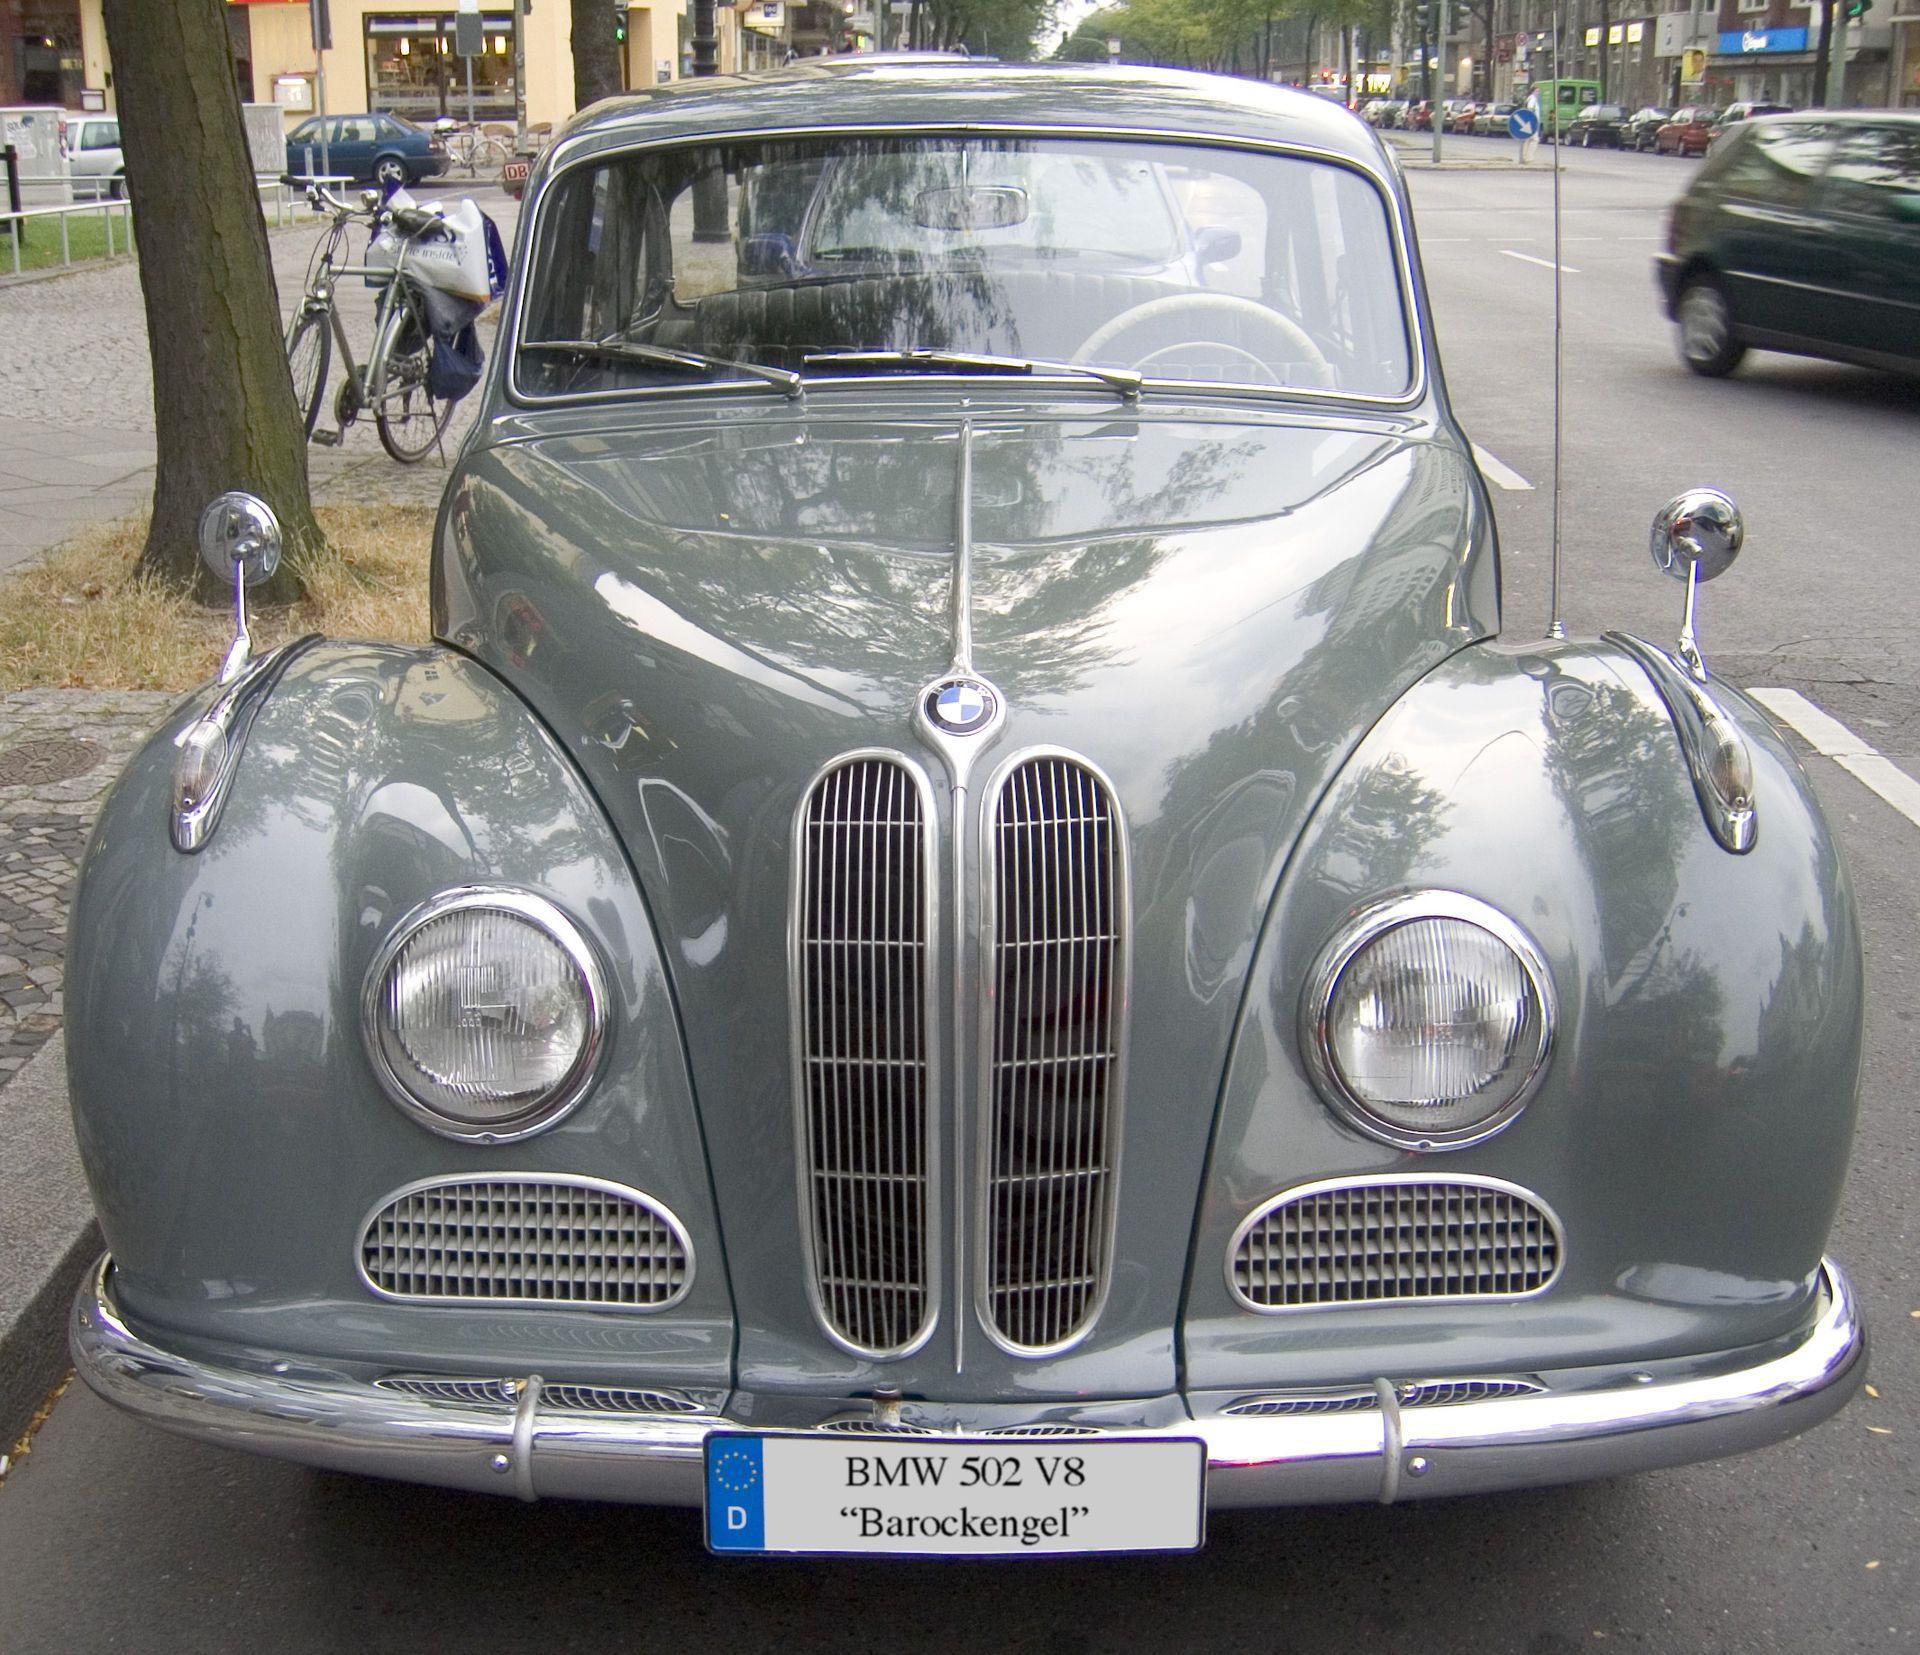 88d753f14cac6a1c6bac2341f3e188d3 Fascinating Bmw Z1 for Sale Ebay Cars Trend